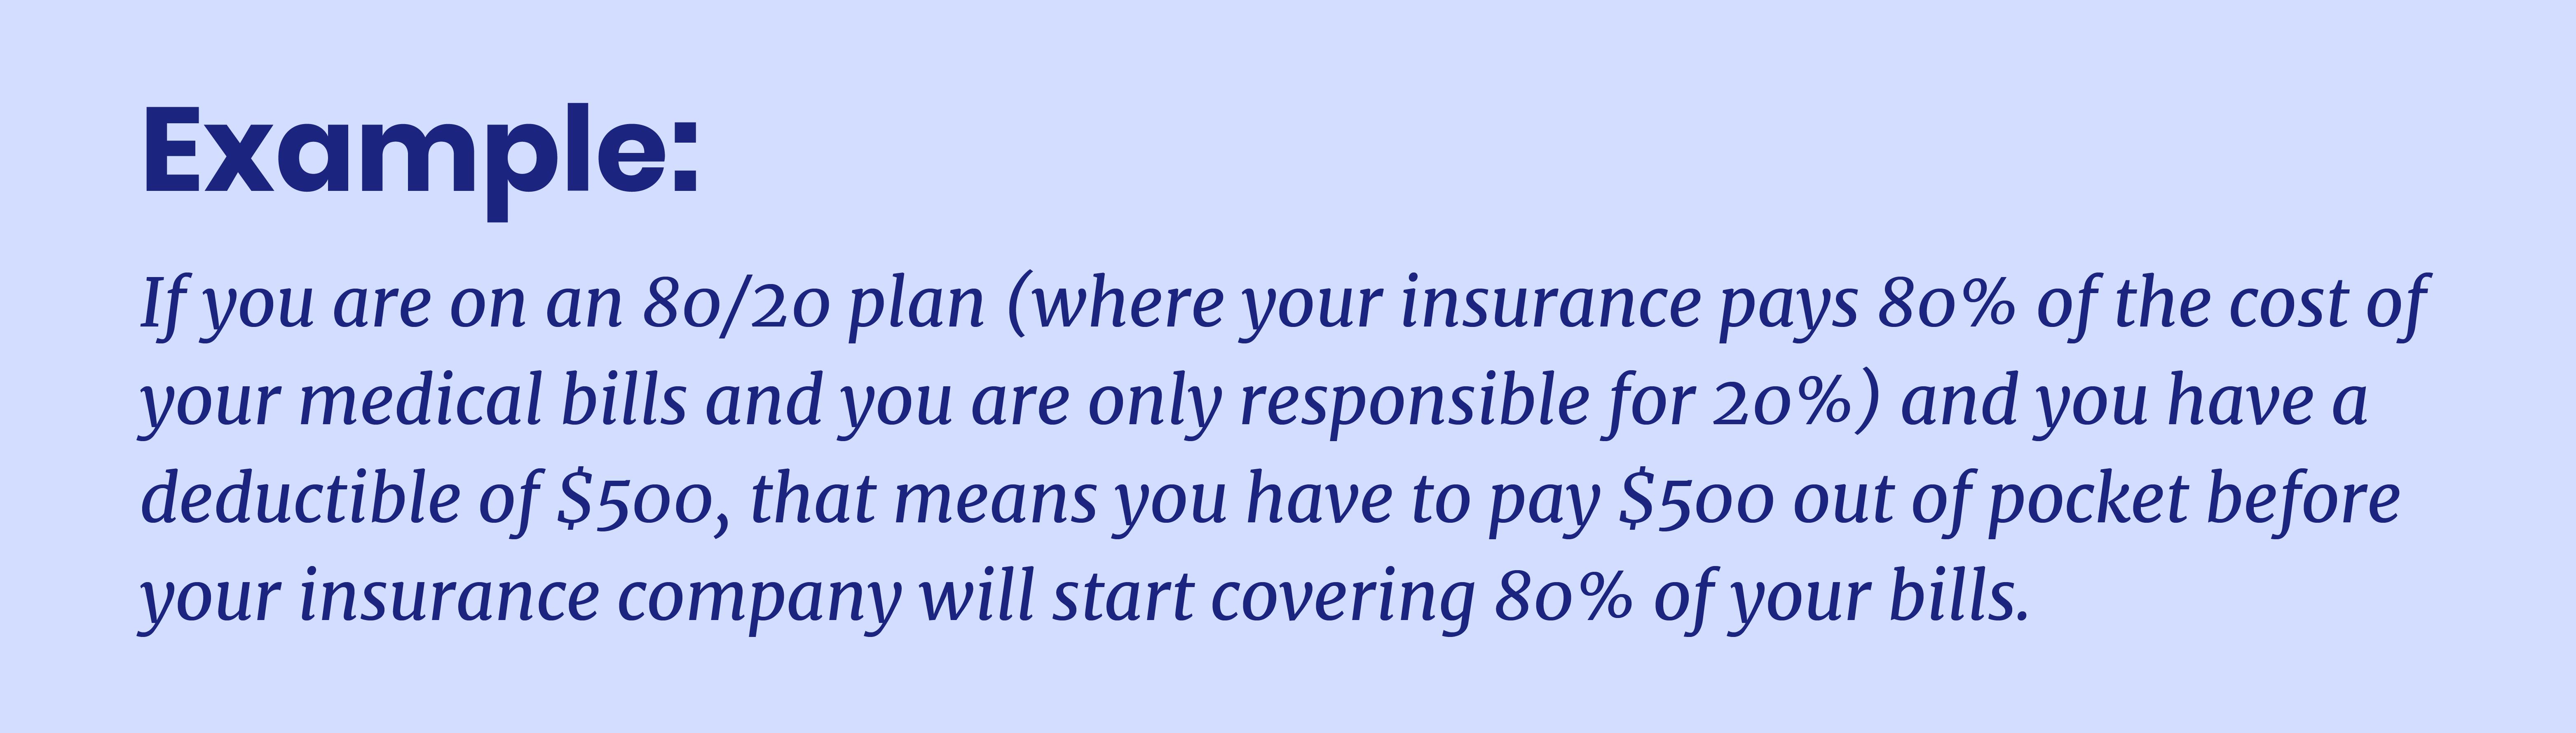 employer provided insurance benefits example